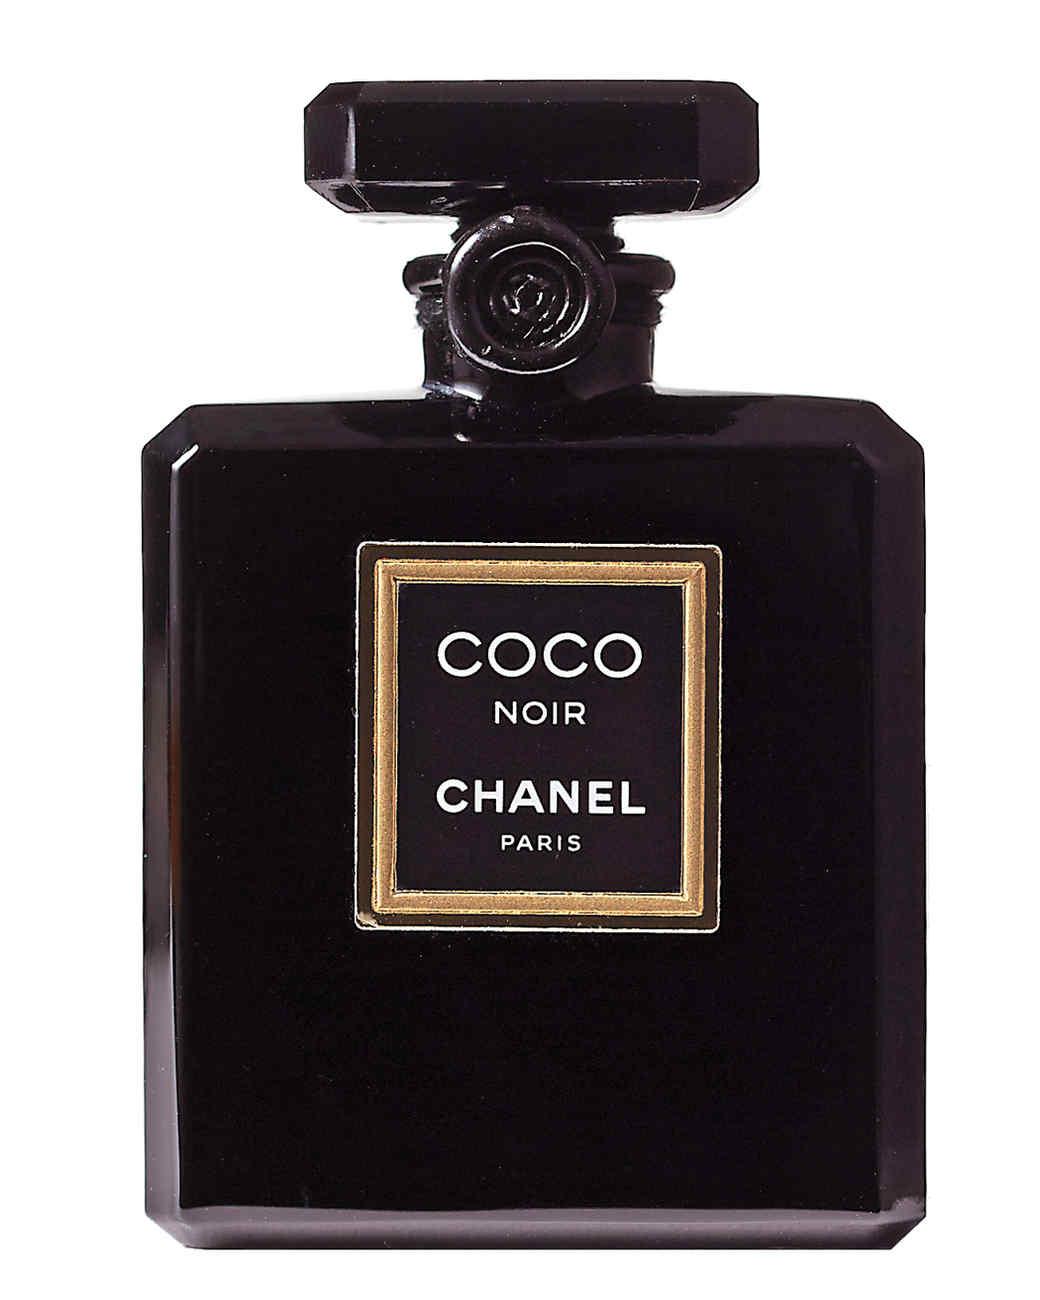 chanel-perfume-095-d111550.jpg